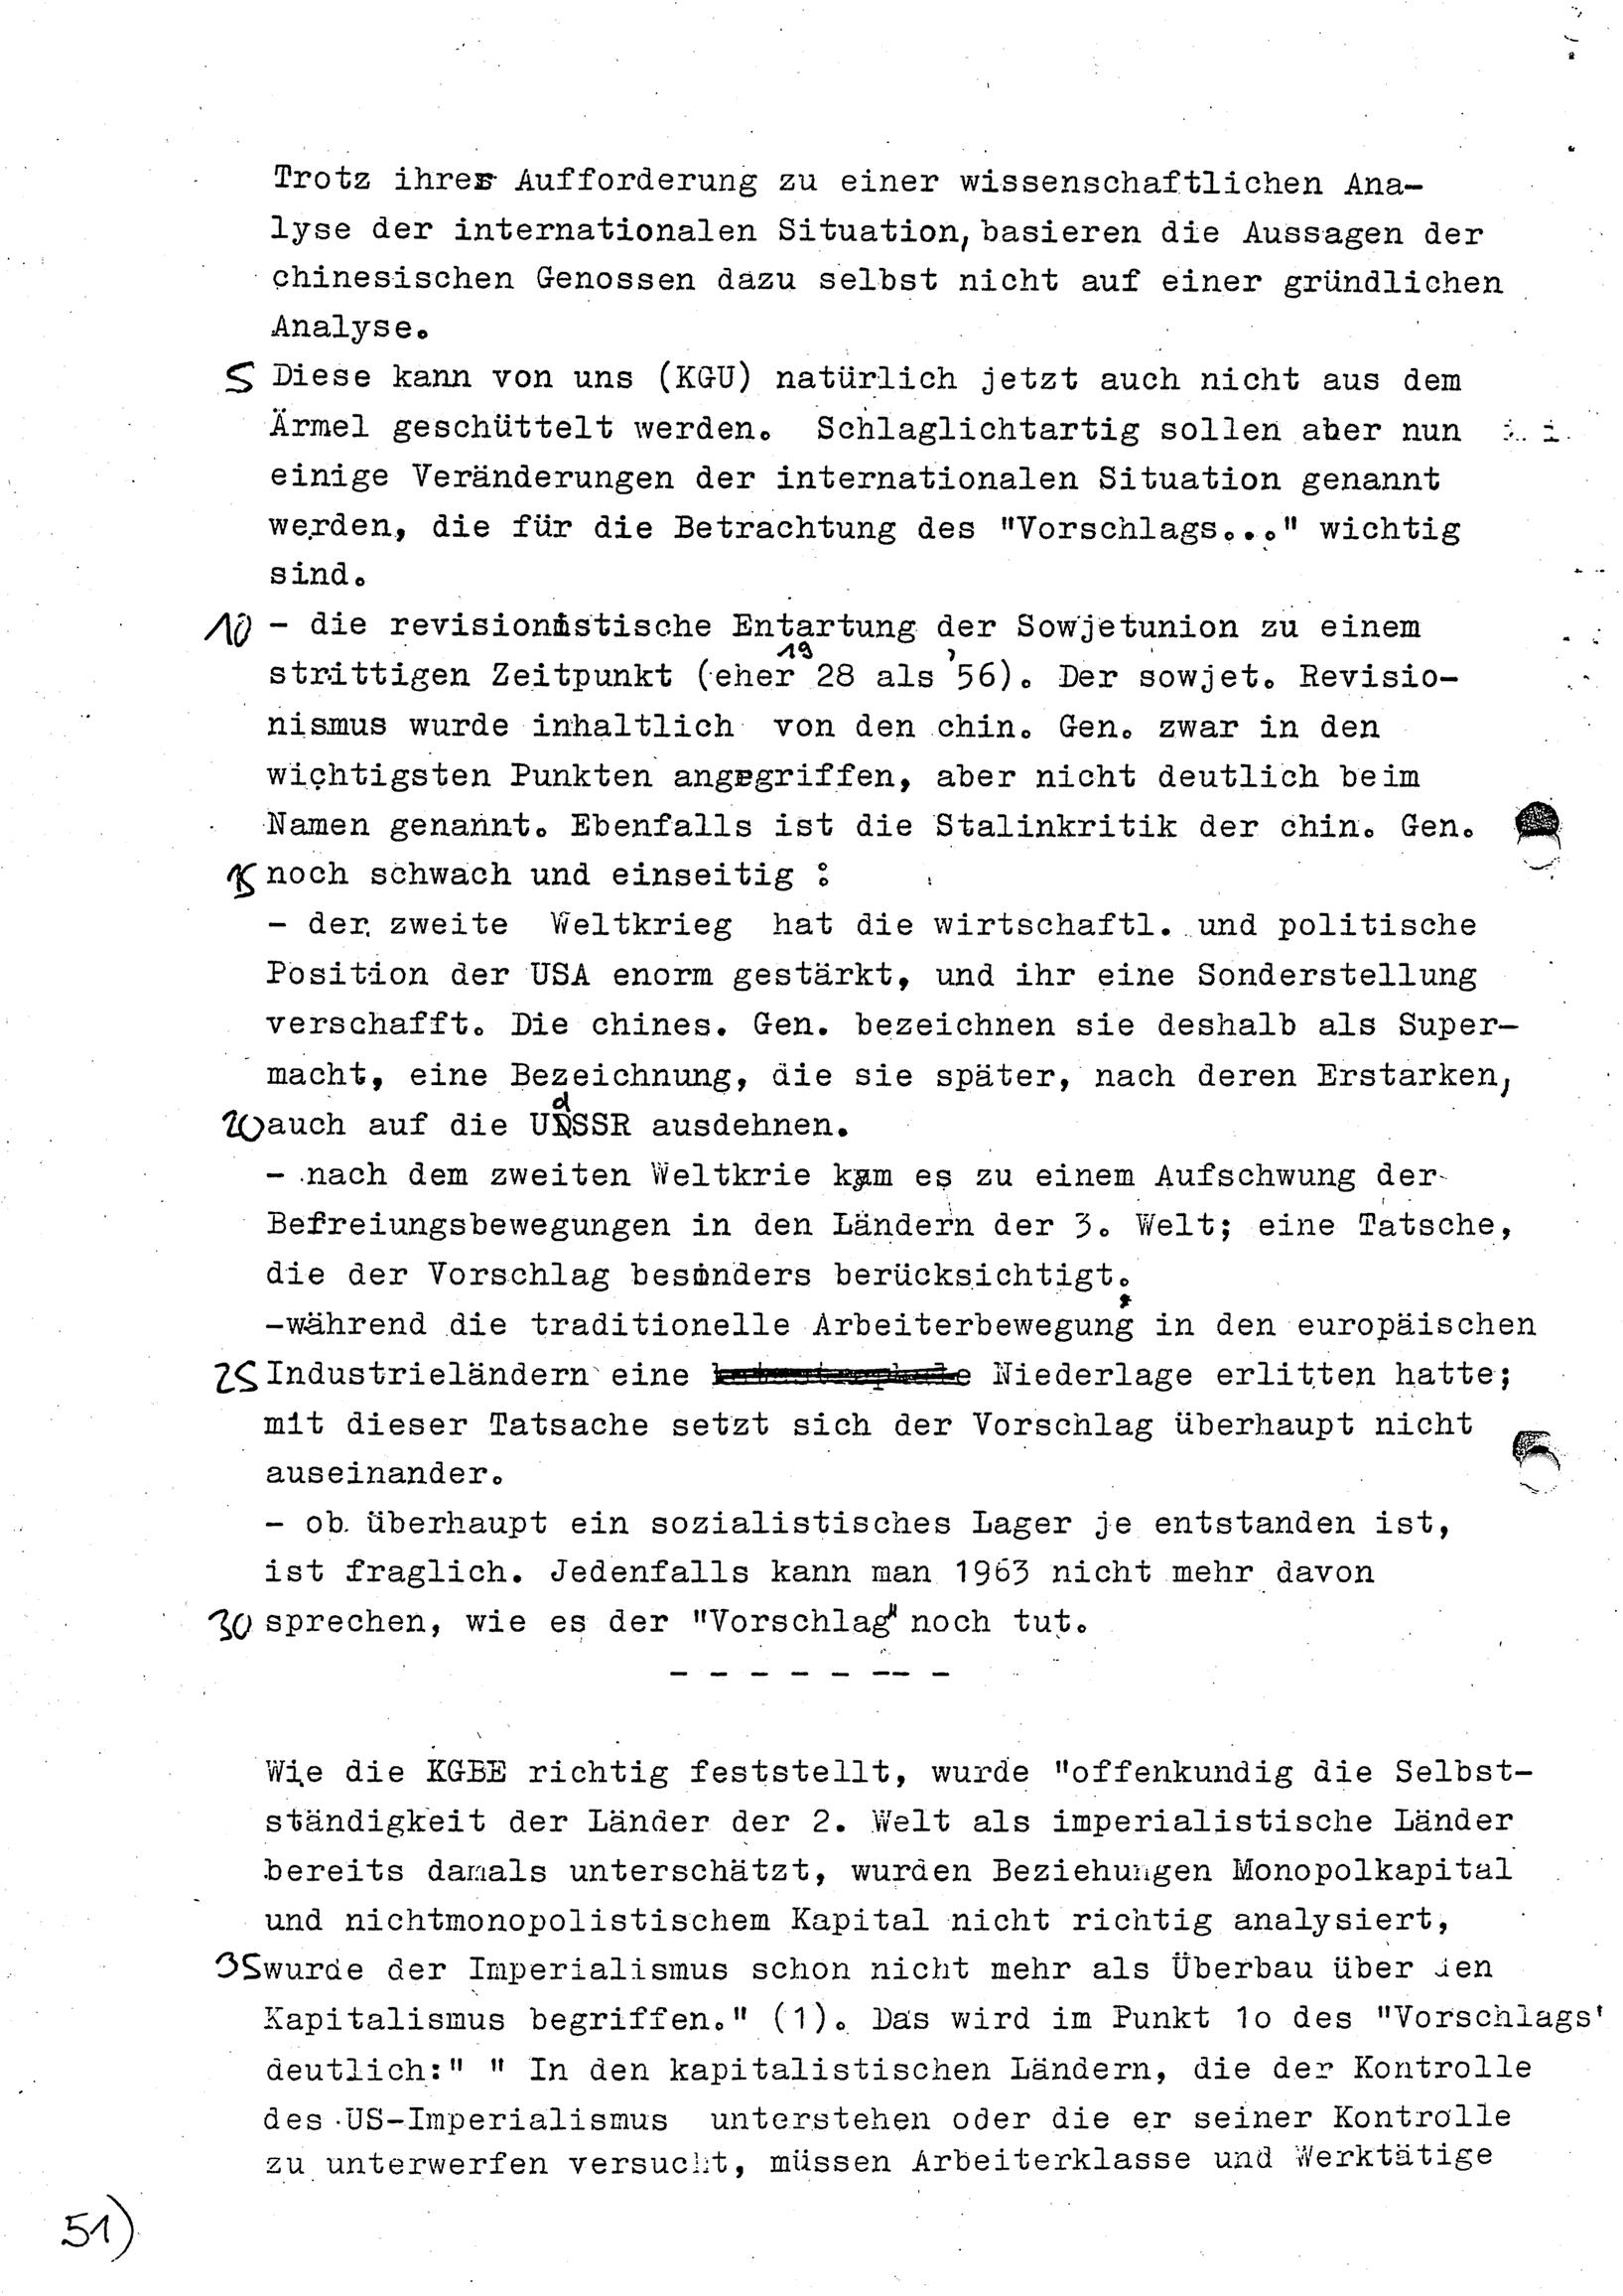 Ulm_KGU_Arbeitsheft_19830425_015_054